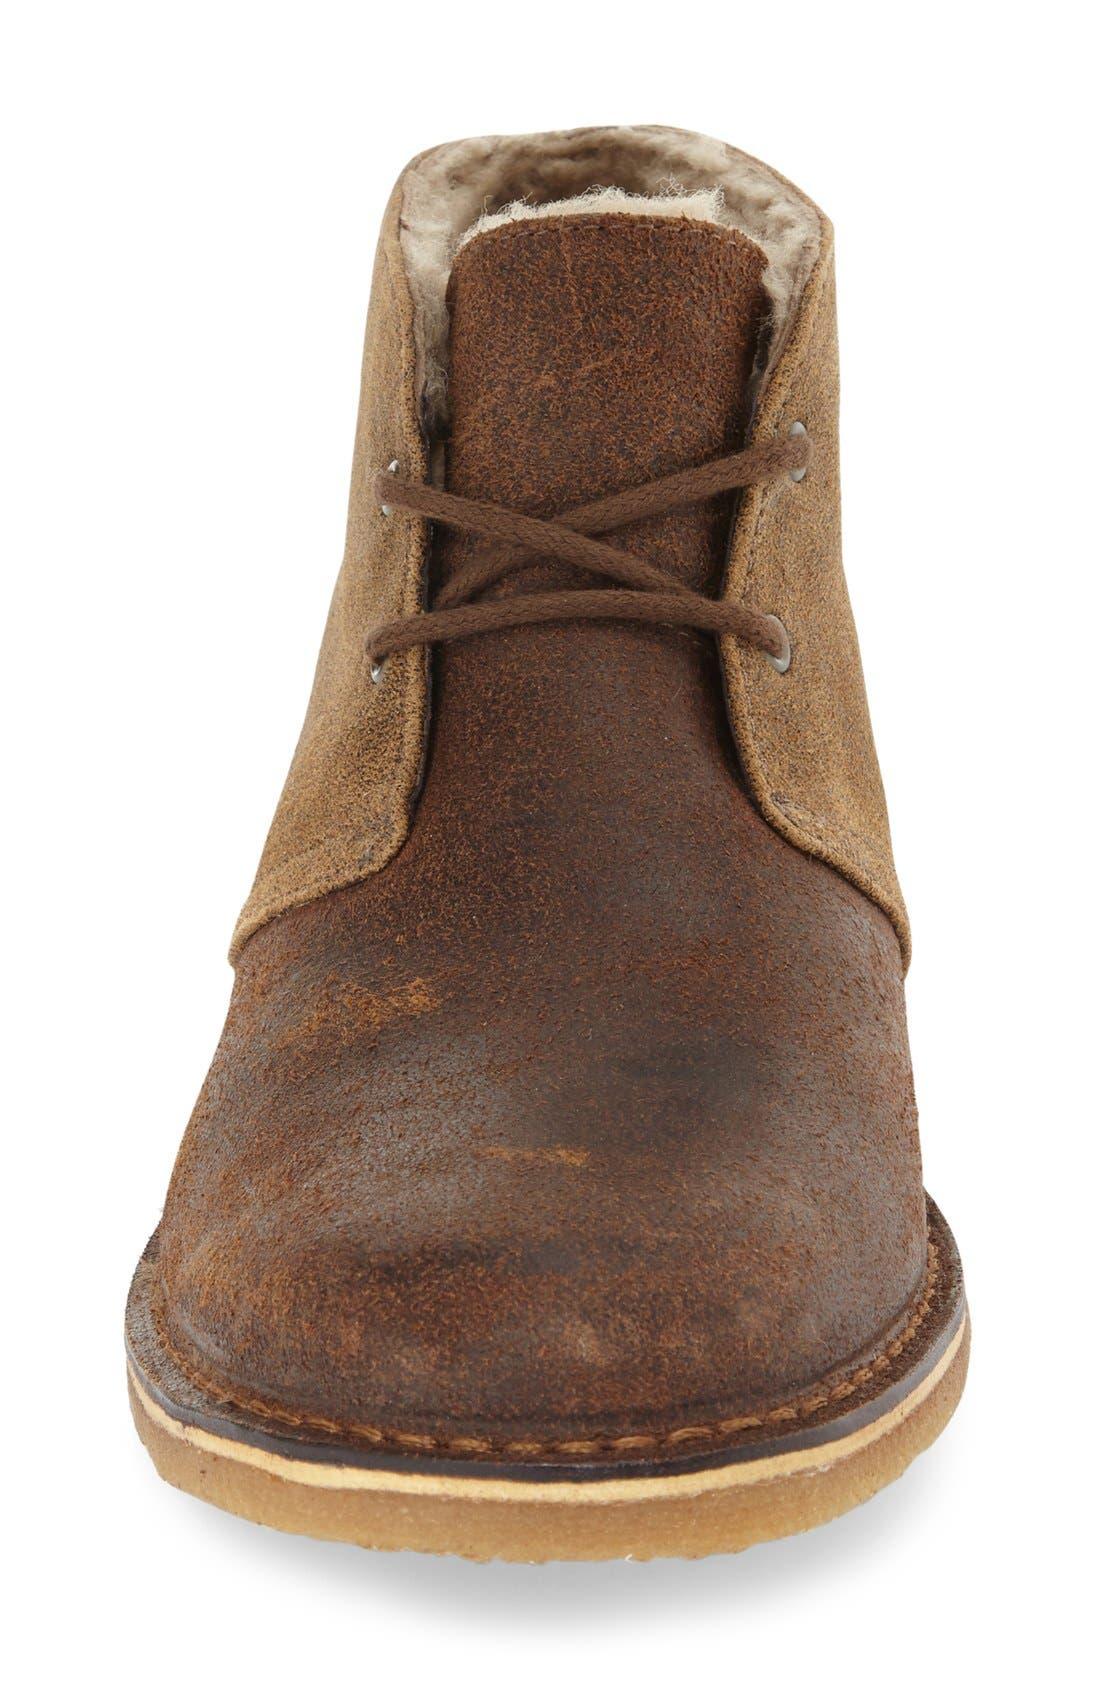 Leighton Chukka Boot,                             Alternate thumbnail 3, color,                             Bomber Jacket Chestnut